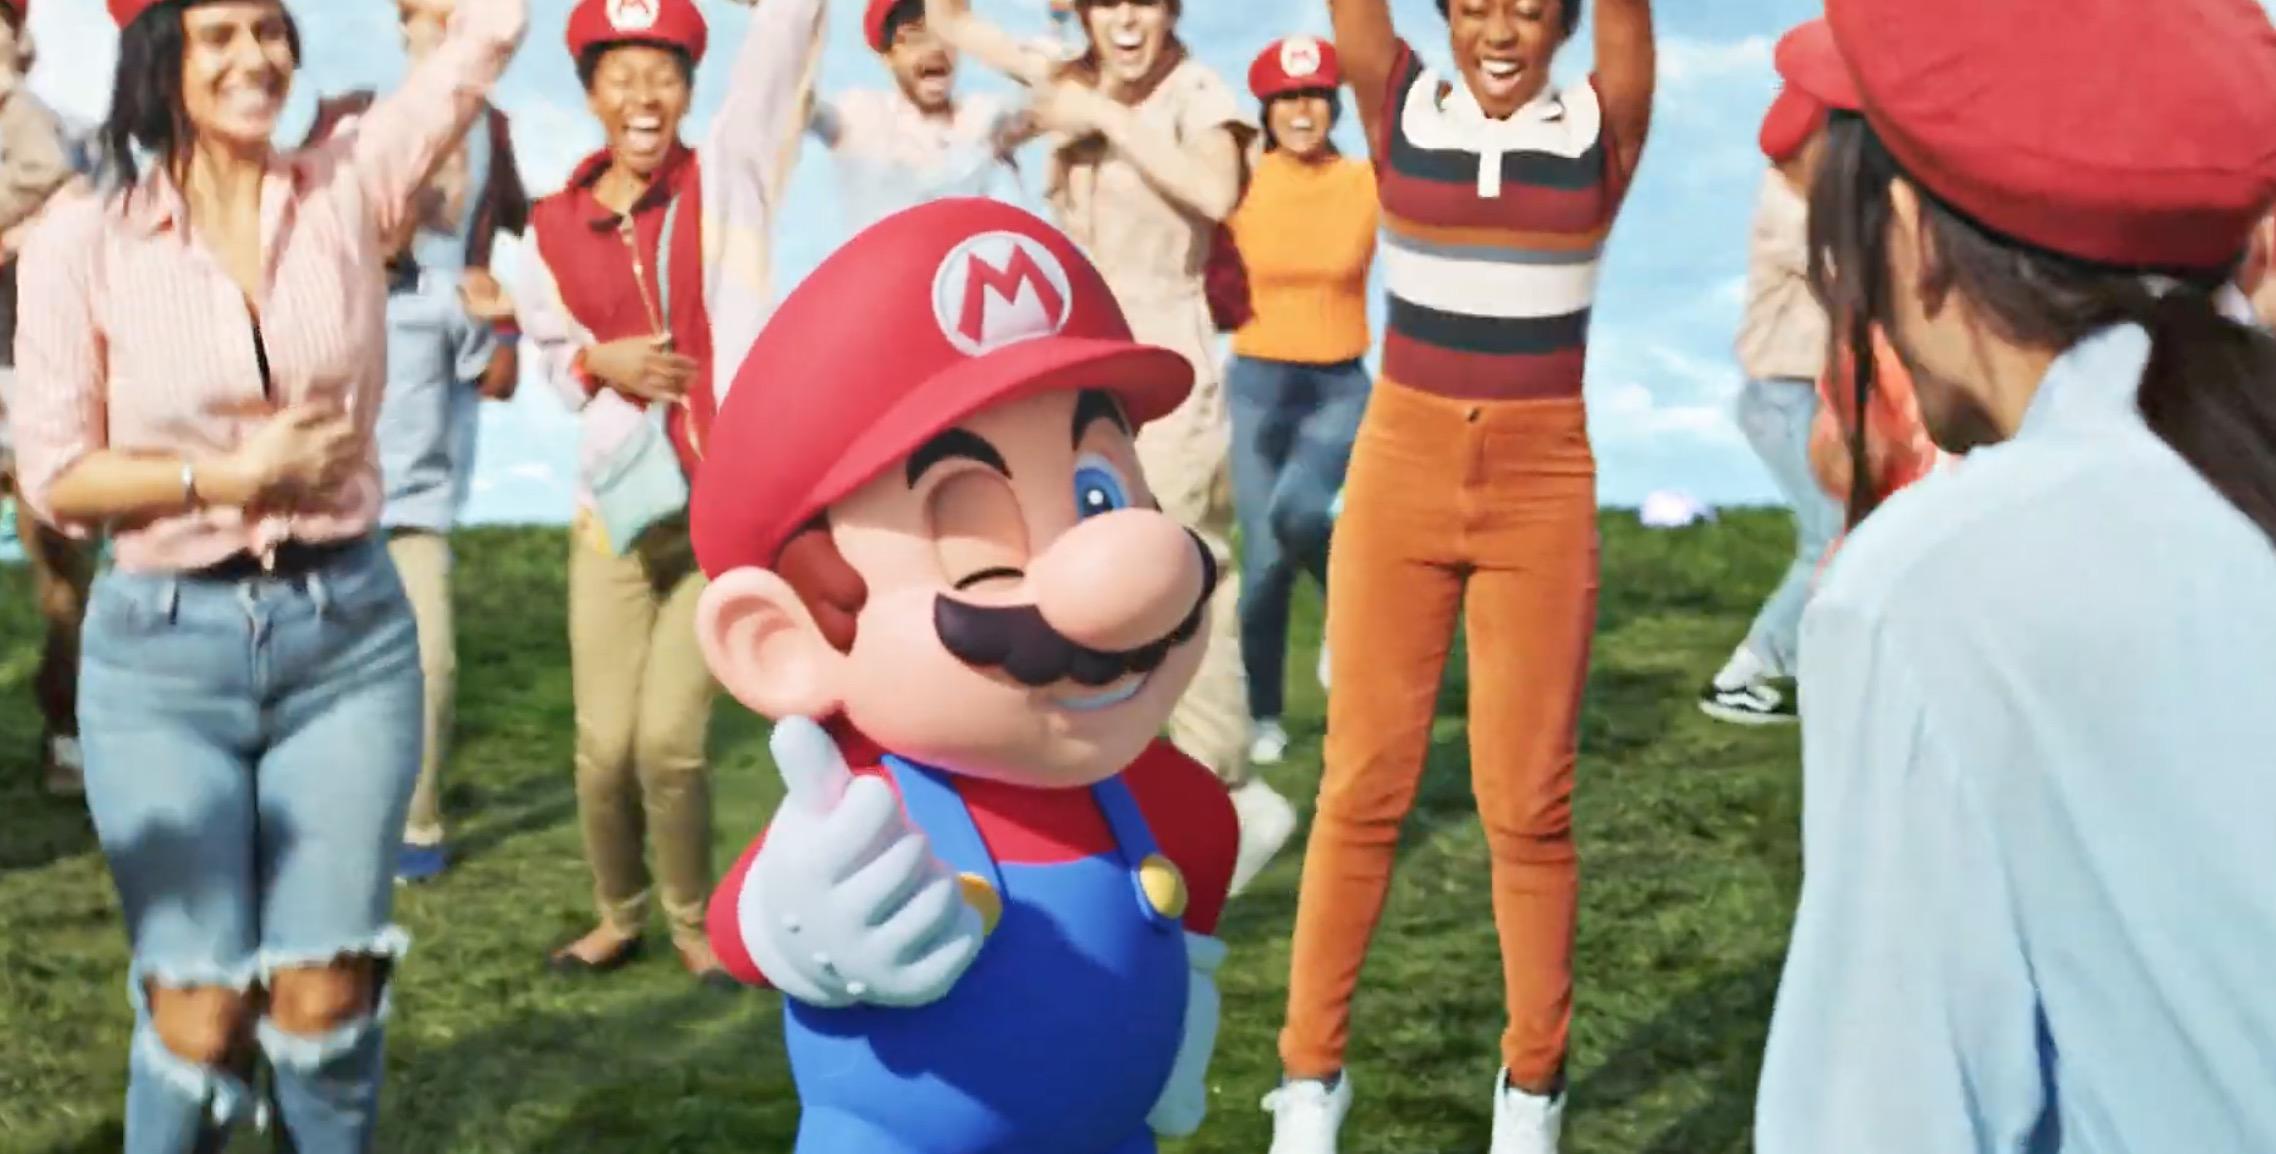 This music video has whet my appetite for Super Nintendo World screenshot